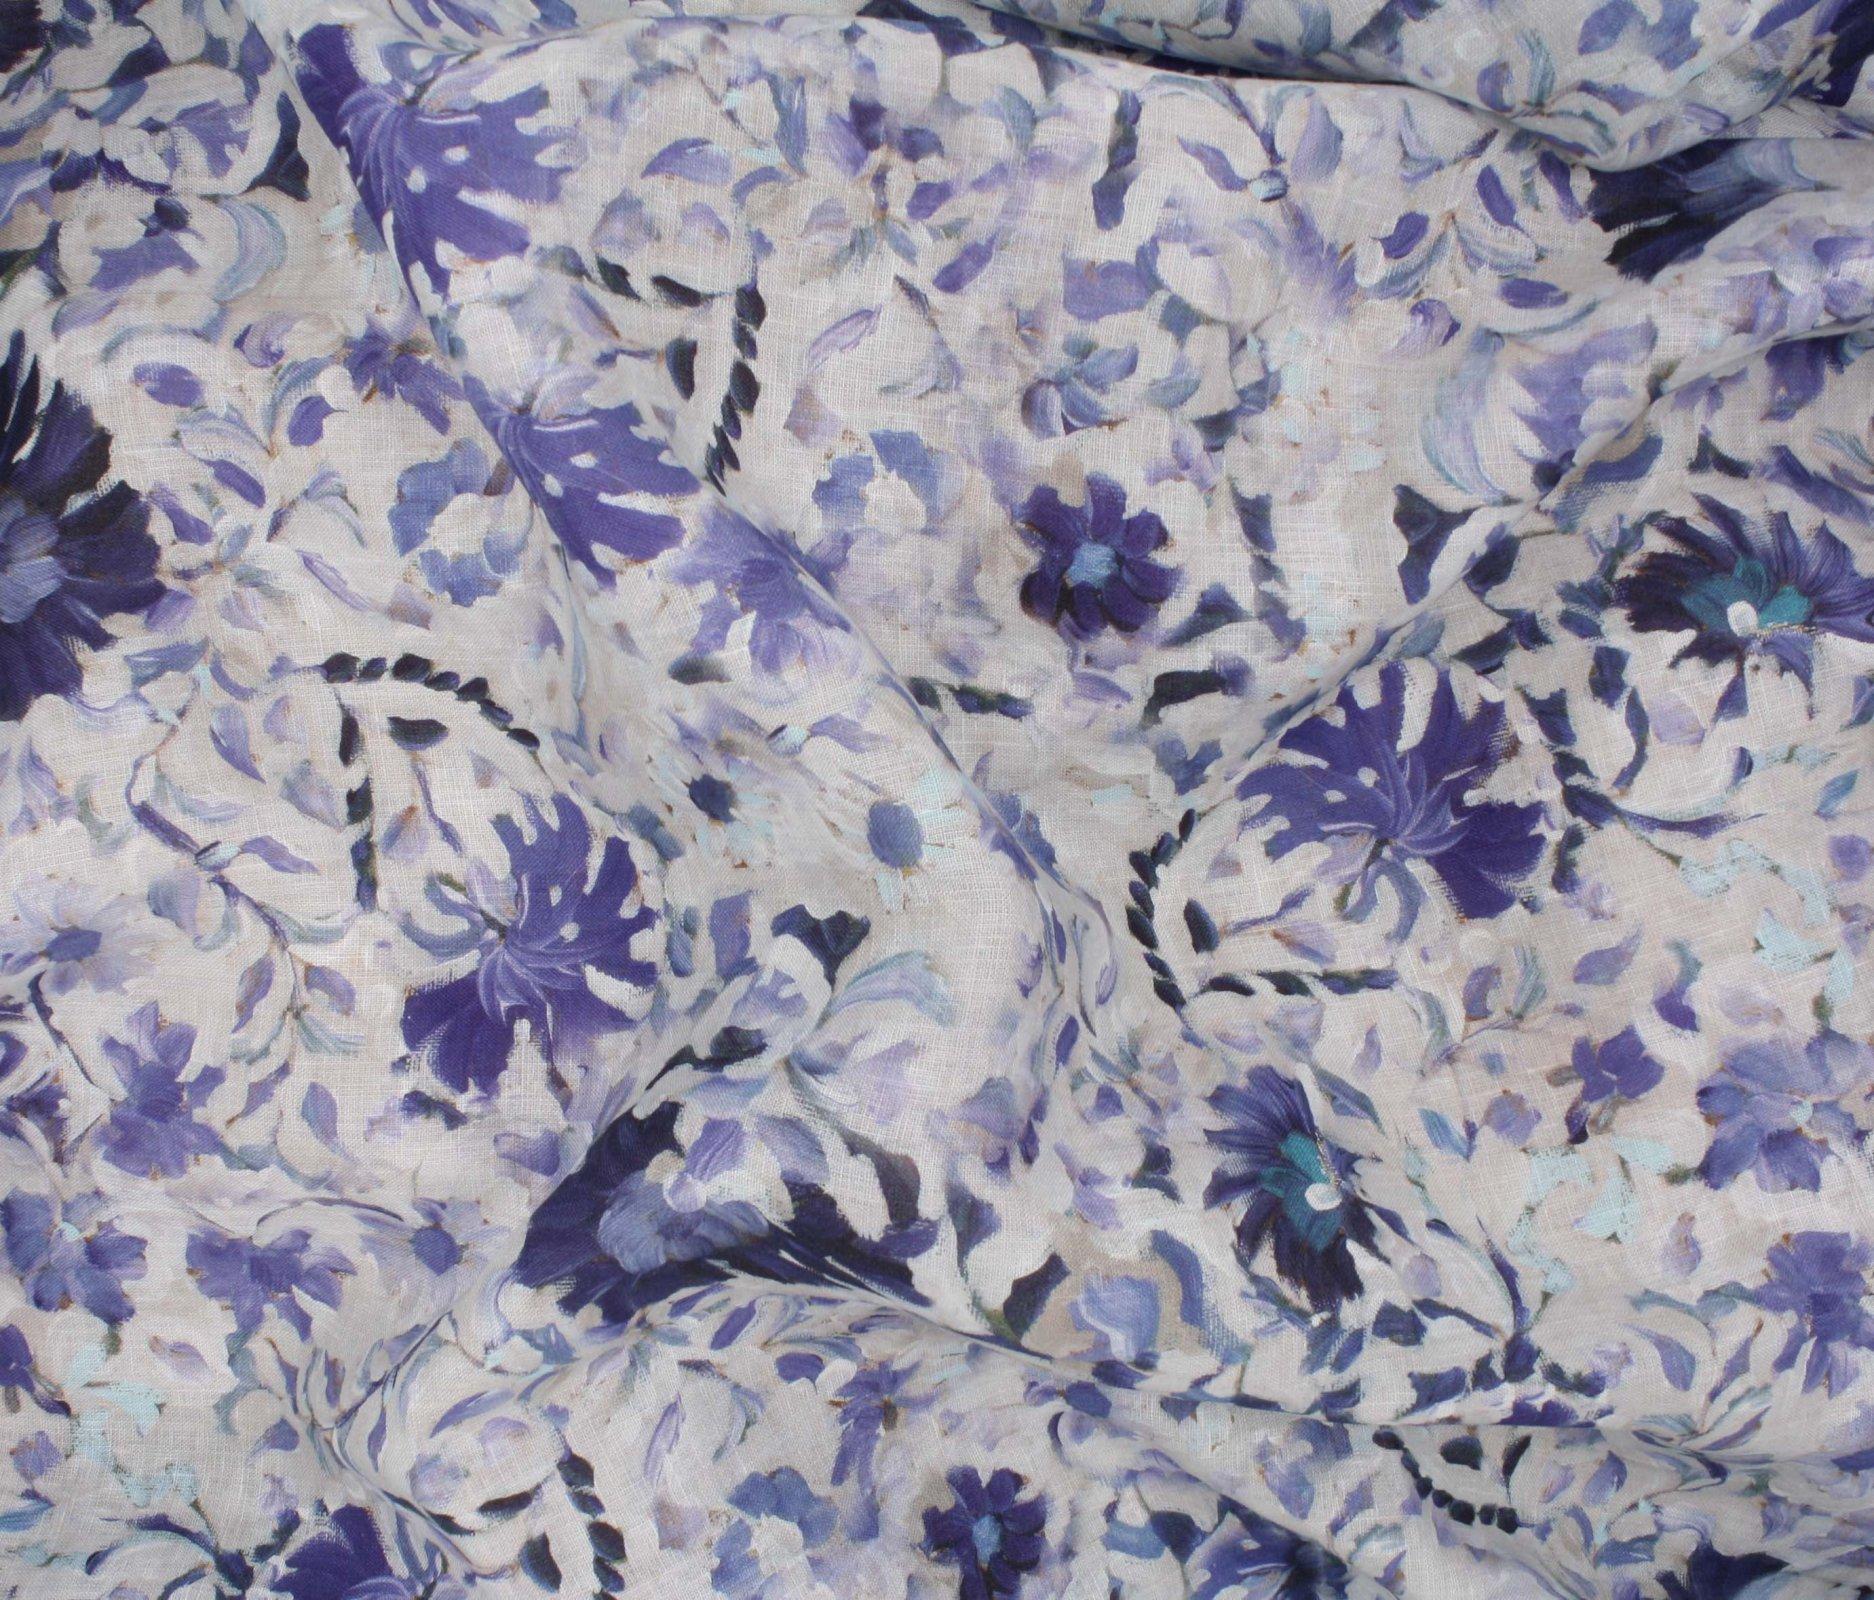 Digital Print Linen - Blue Watercolors